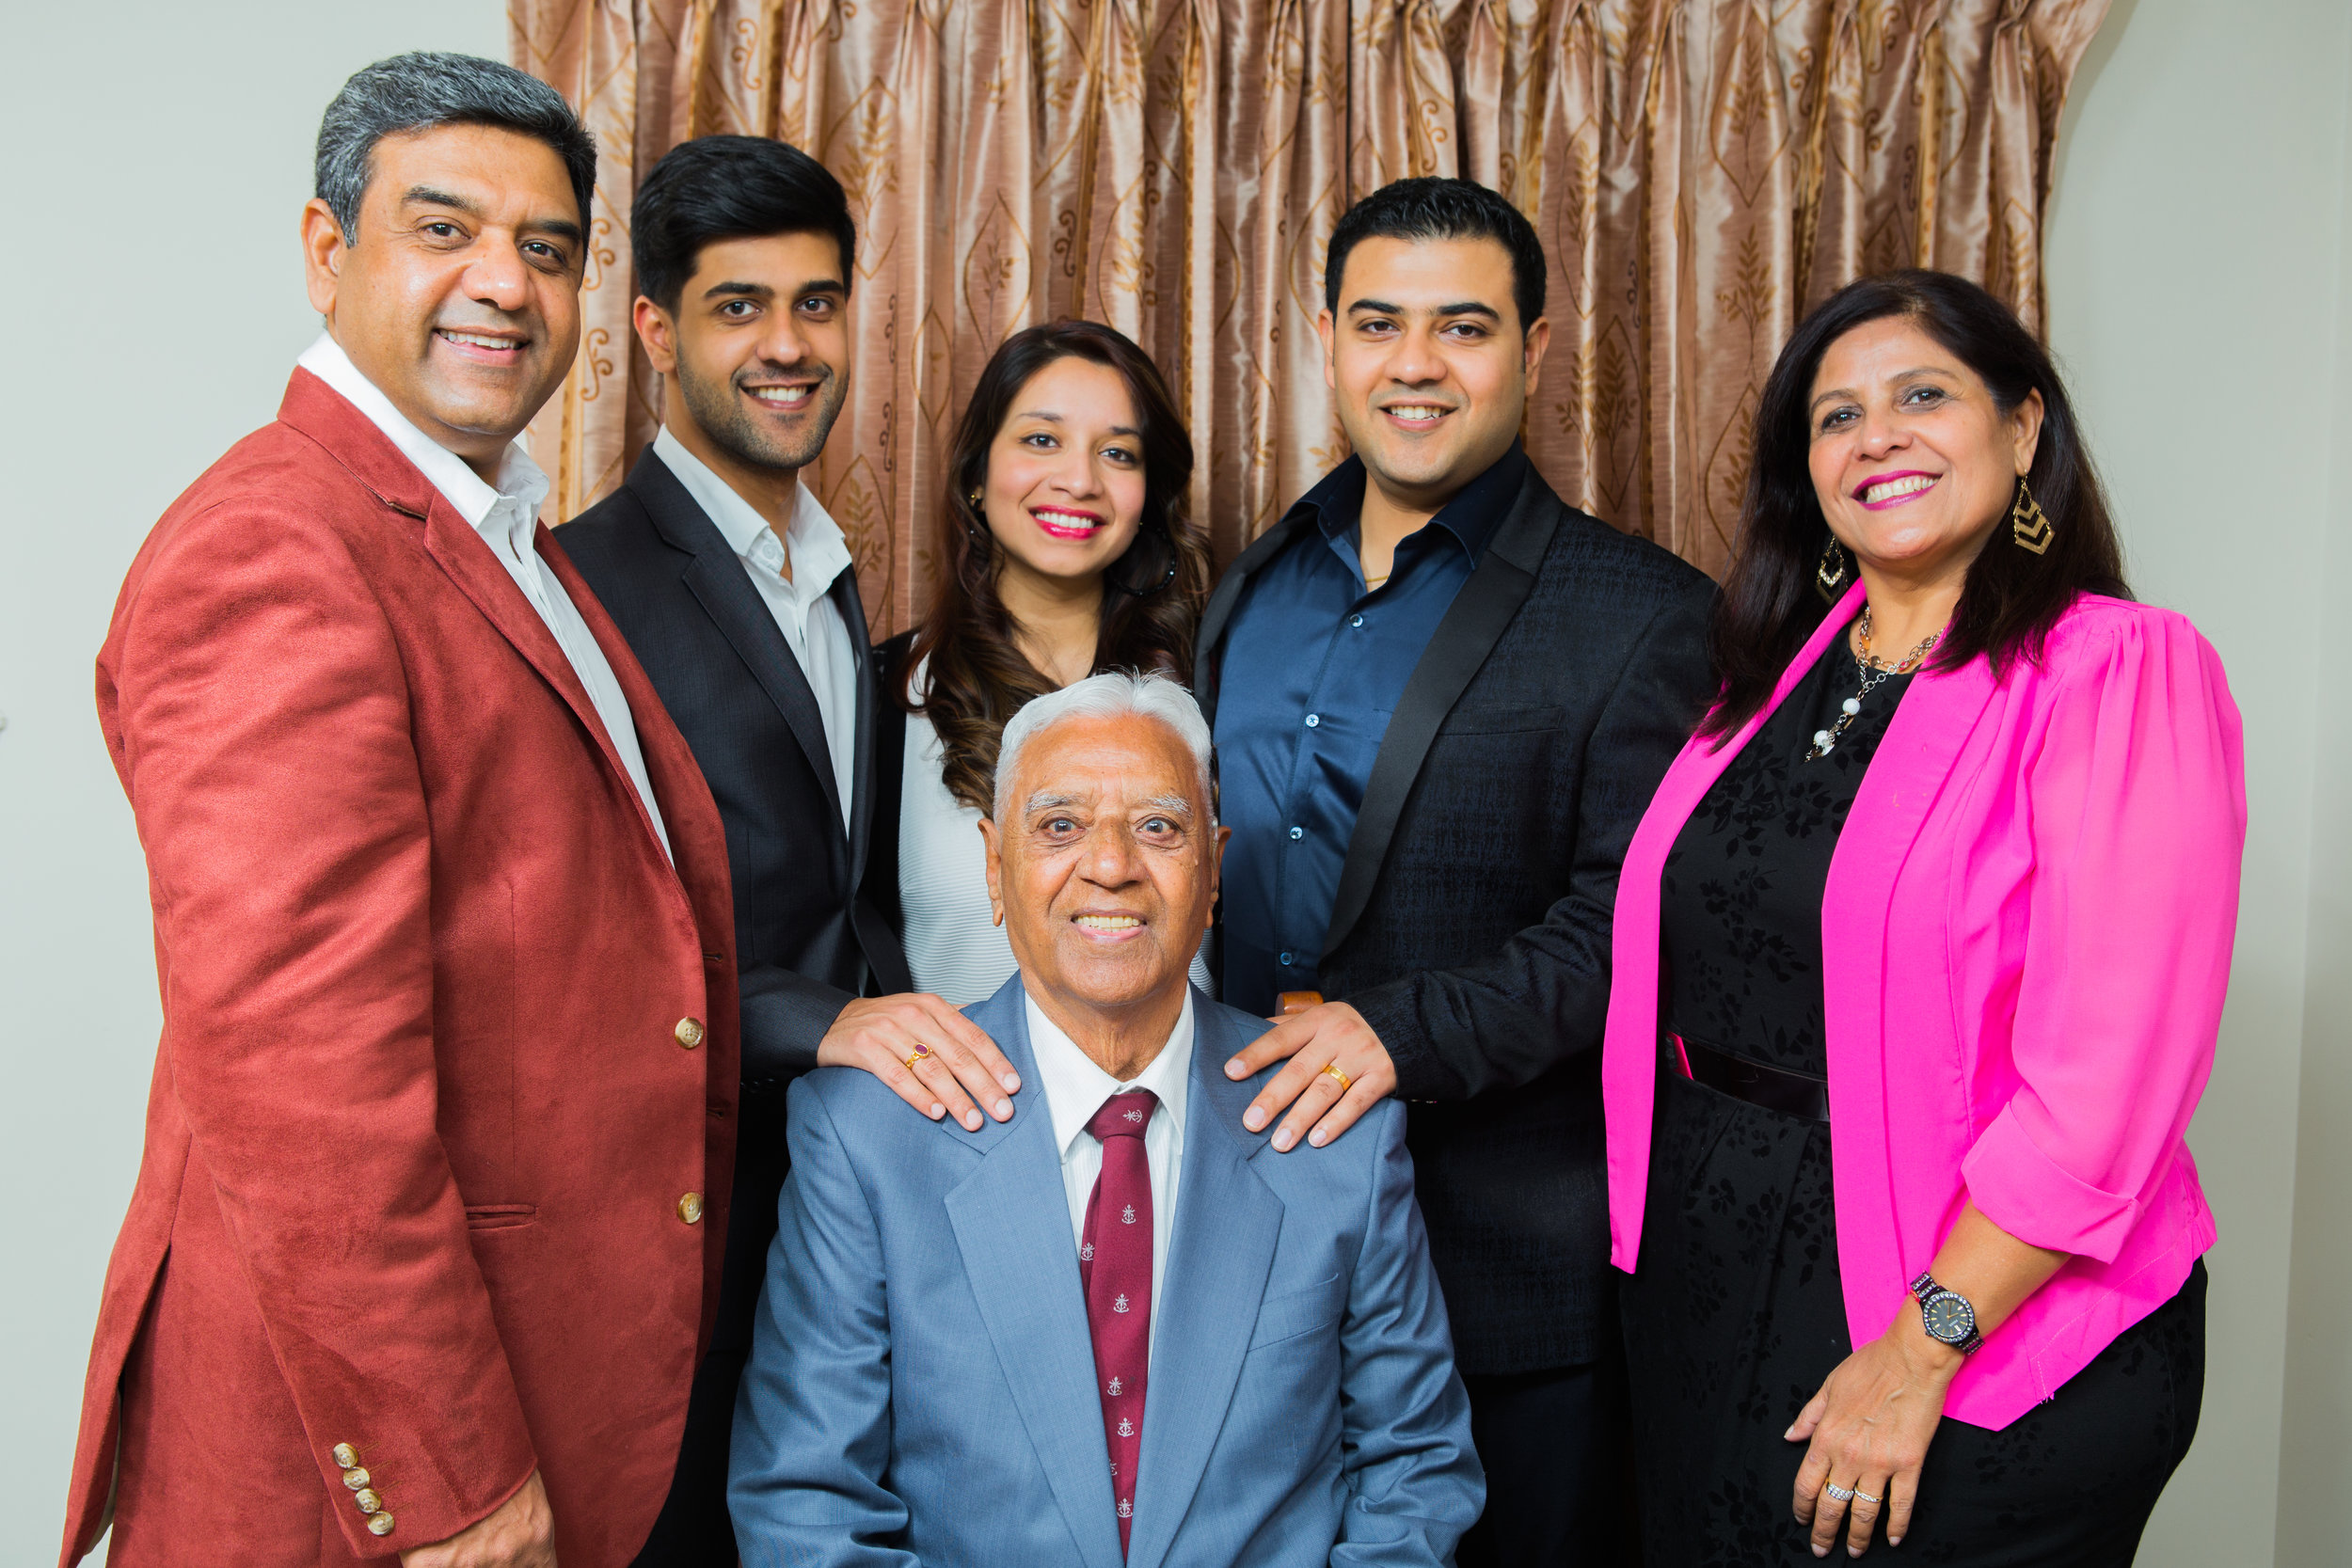 BHATIA'S - FAMILY PORTRAITS